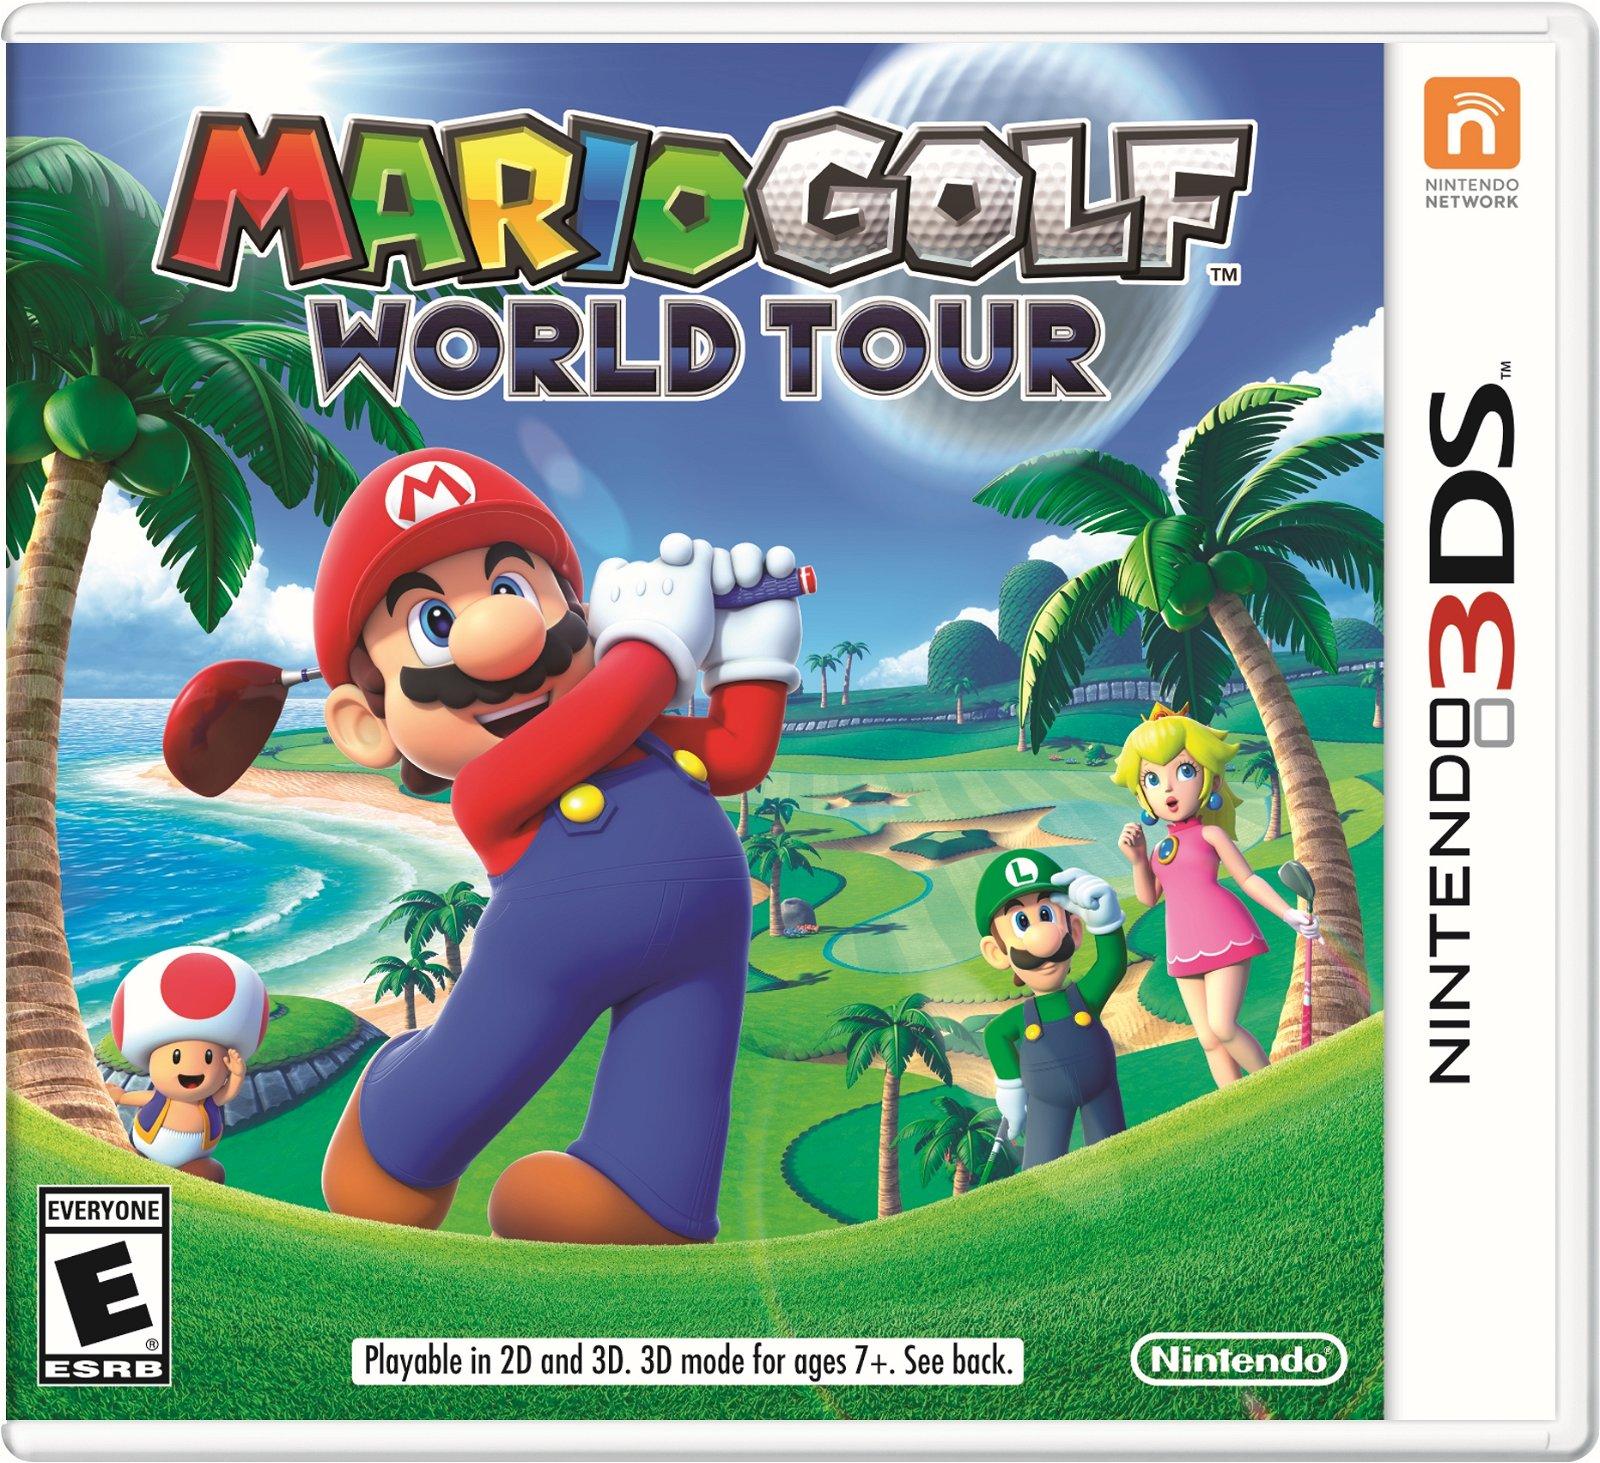 Mario Golf World Tour (3ds) Review 1